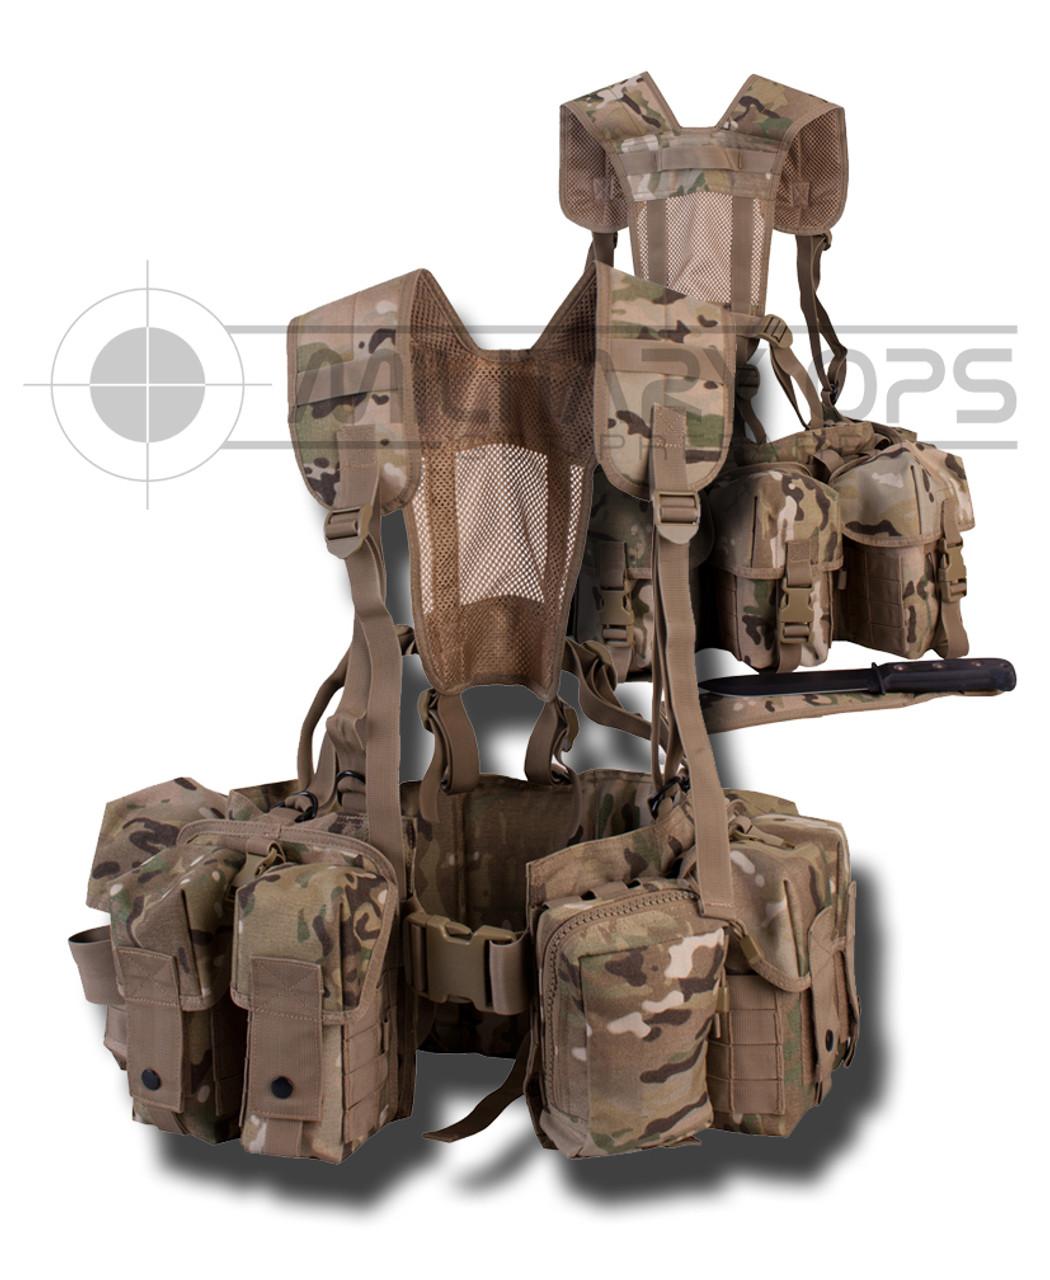 f4eec77854391 Molle Airborne   Special Forces Webbing Multicam MTP - MilitaryOps Ltd